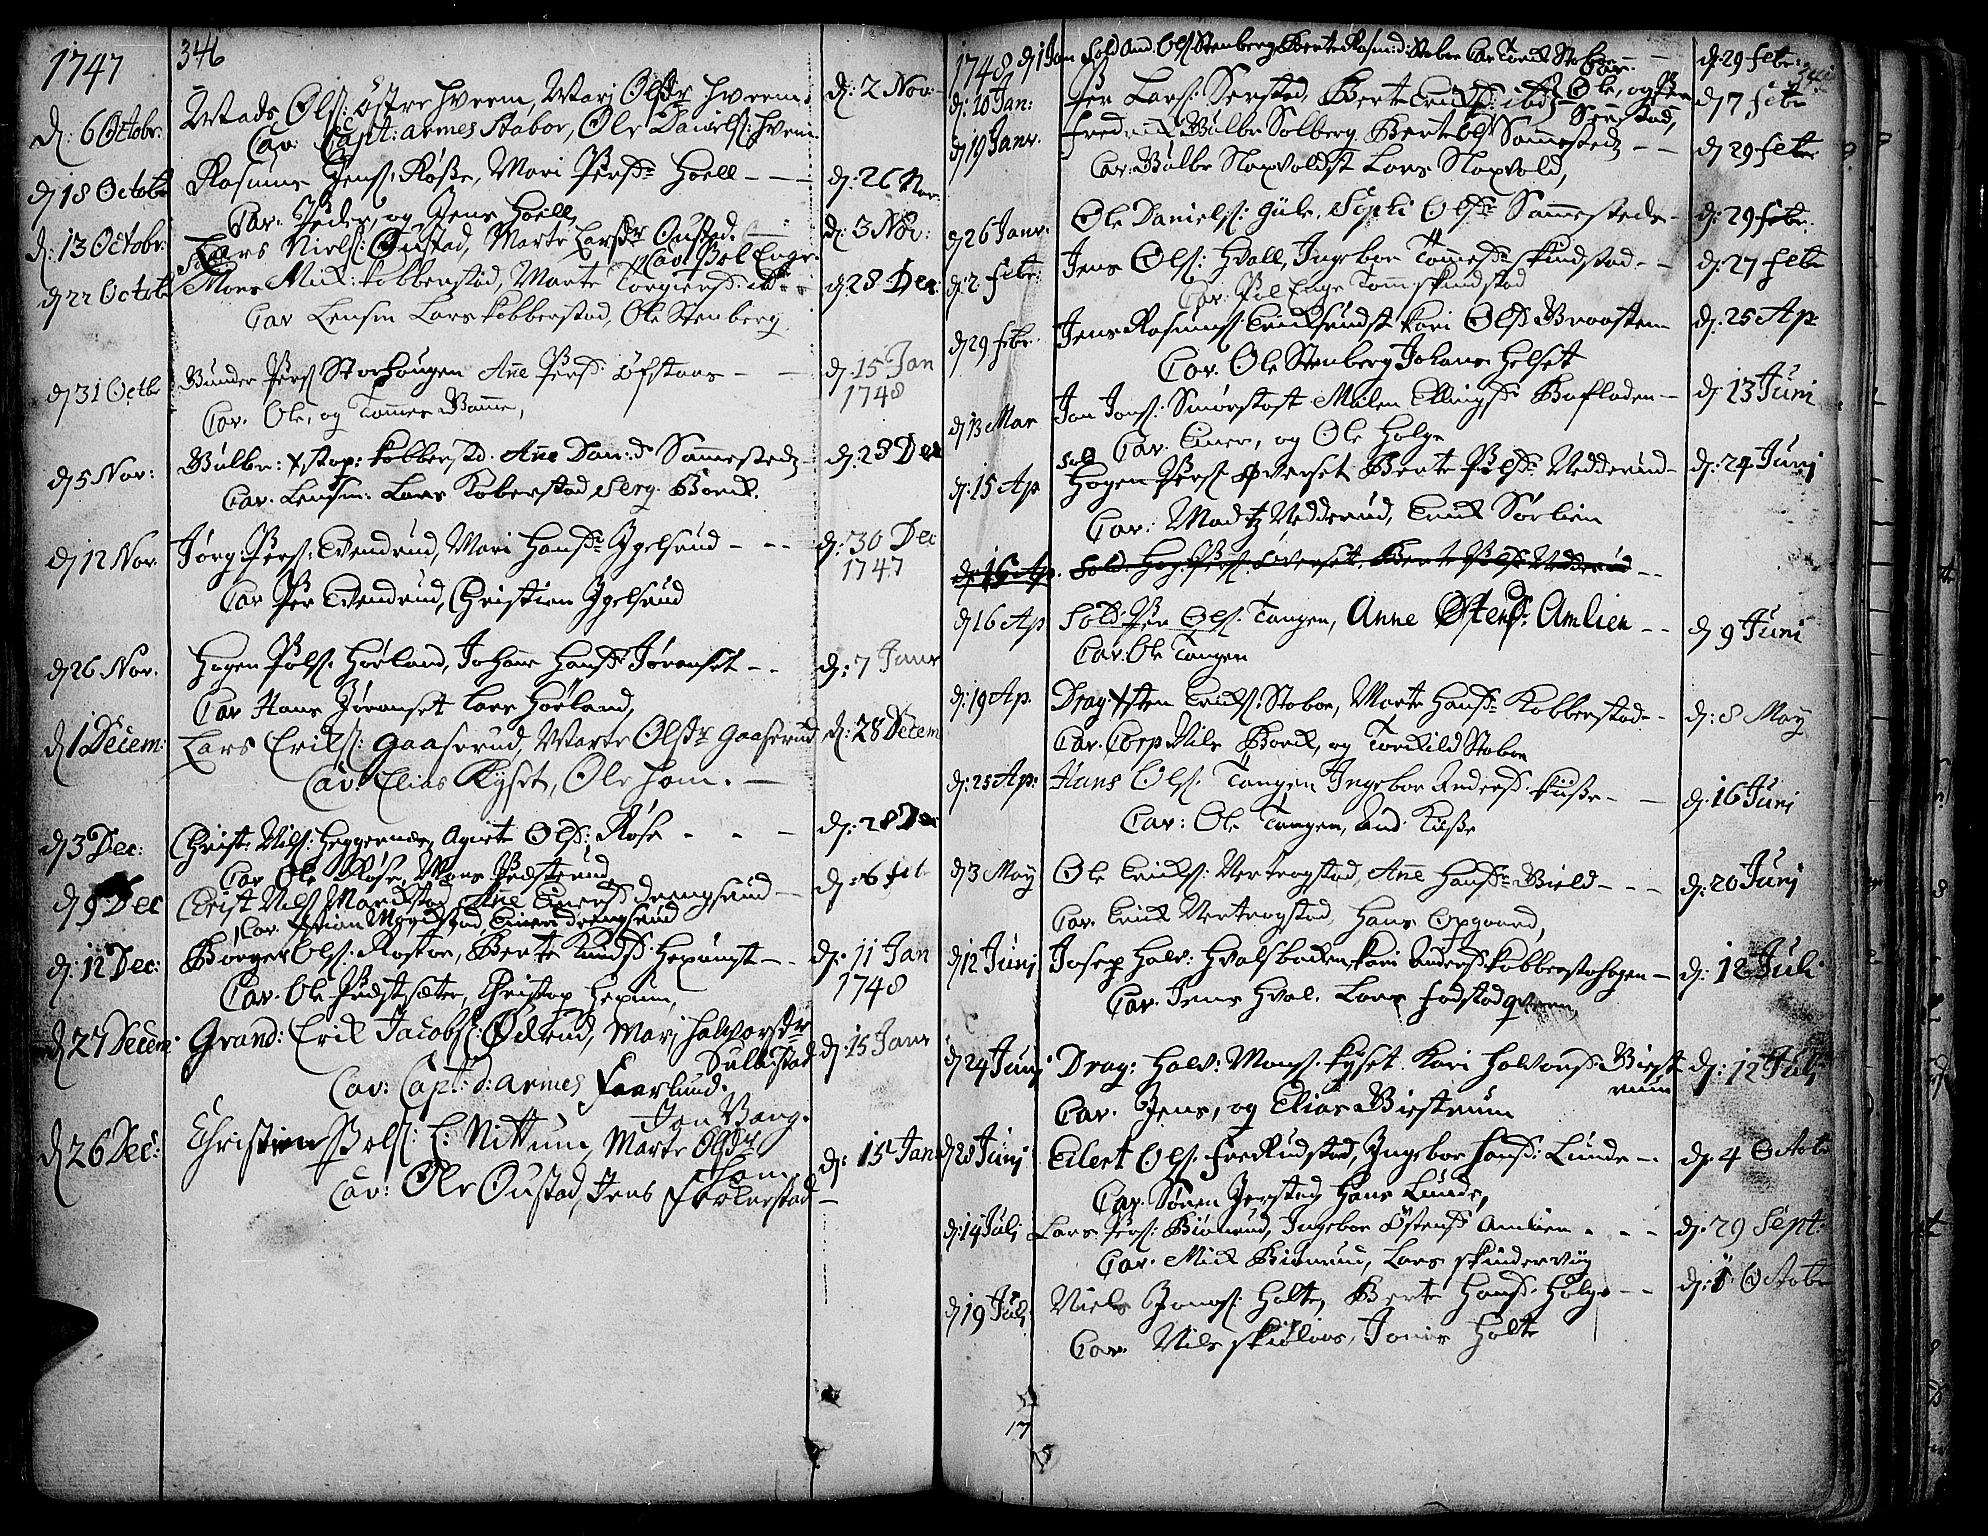 SAH, Toten prestekontor, Ministerialbok nr. 3, 1734-1751, s. 346-347